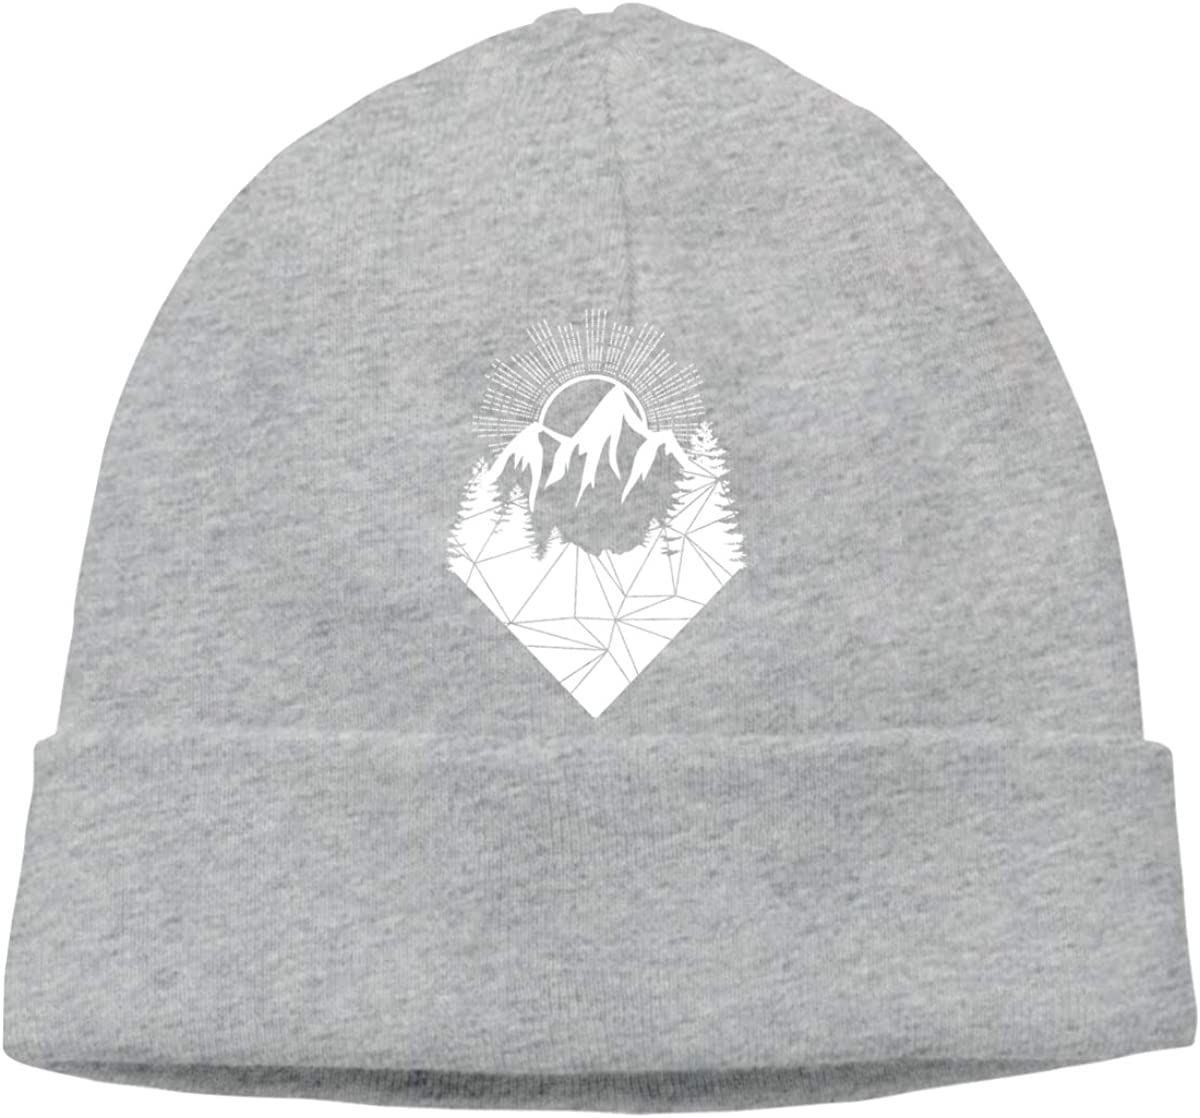 Interesting Forest Mountain Sun Beanies Hat Ski Cap Unisex